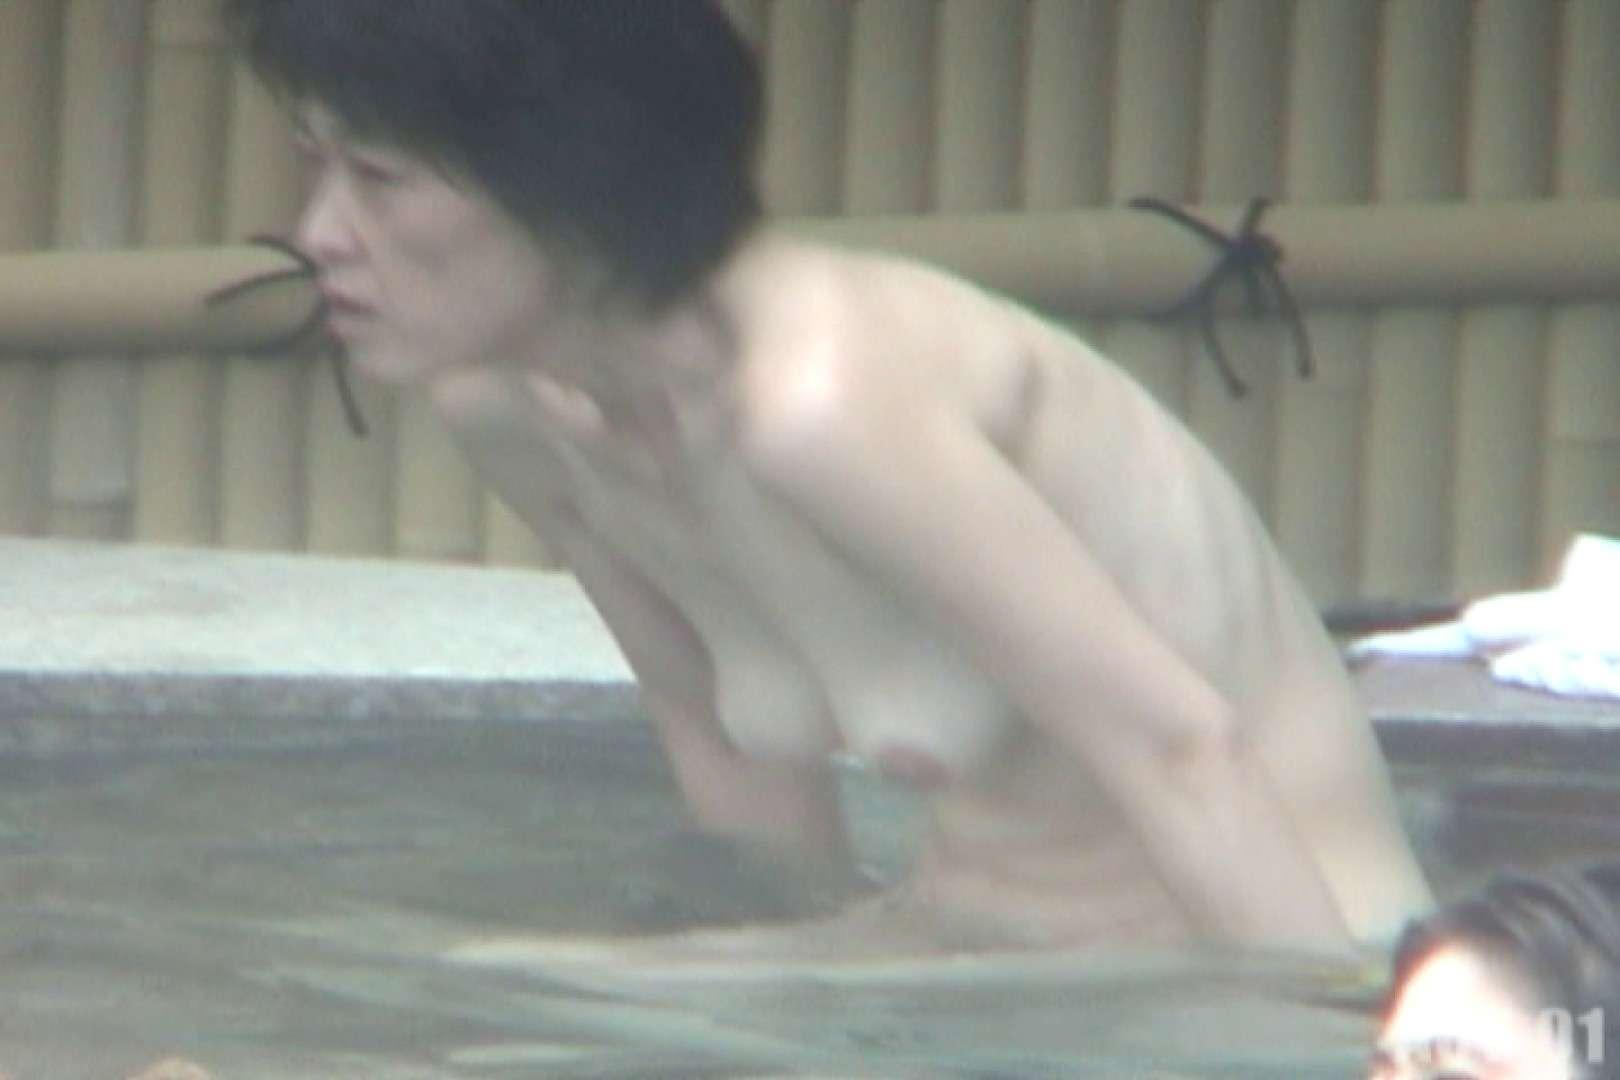 Aquaな露天風呂Vol.717 露天風呂編 | 盗撮シリーズ  111PIX 41